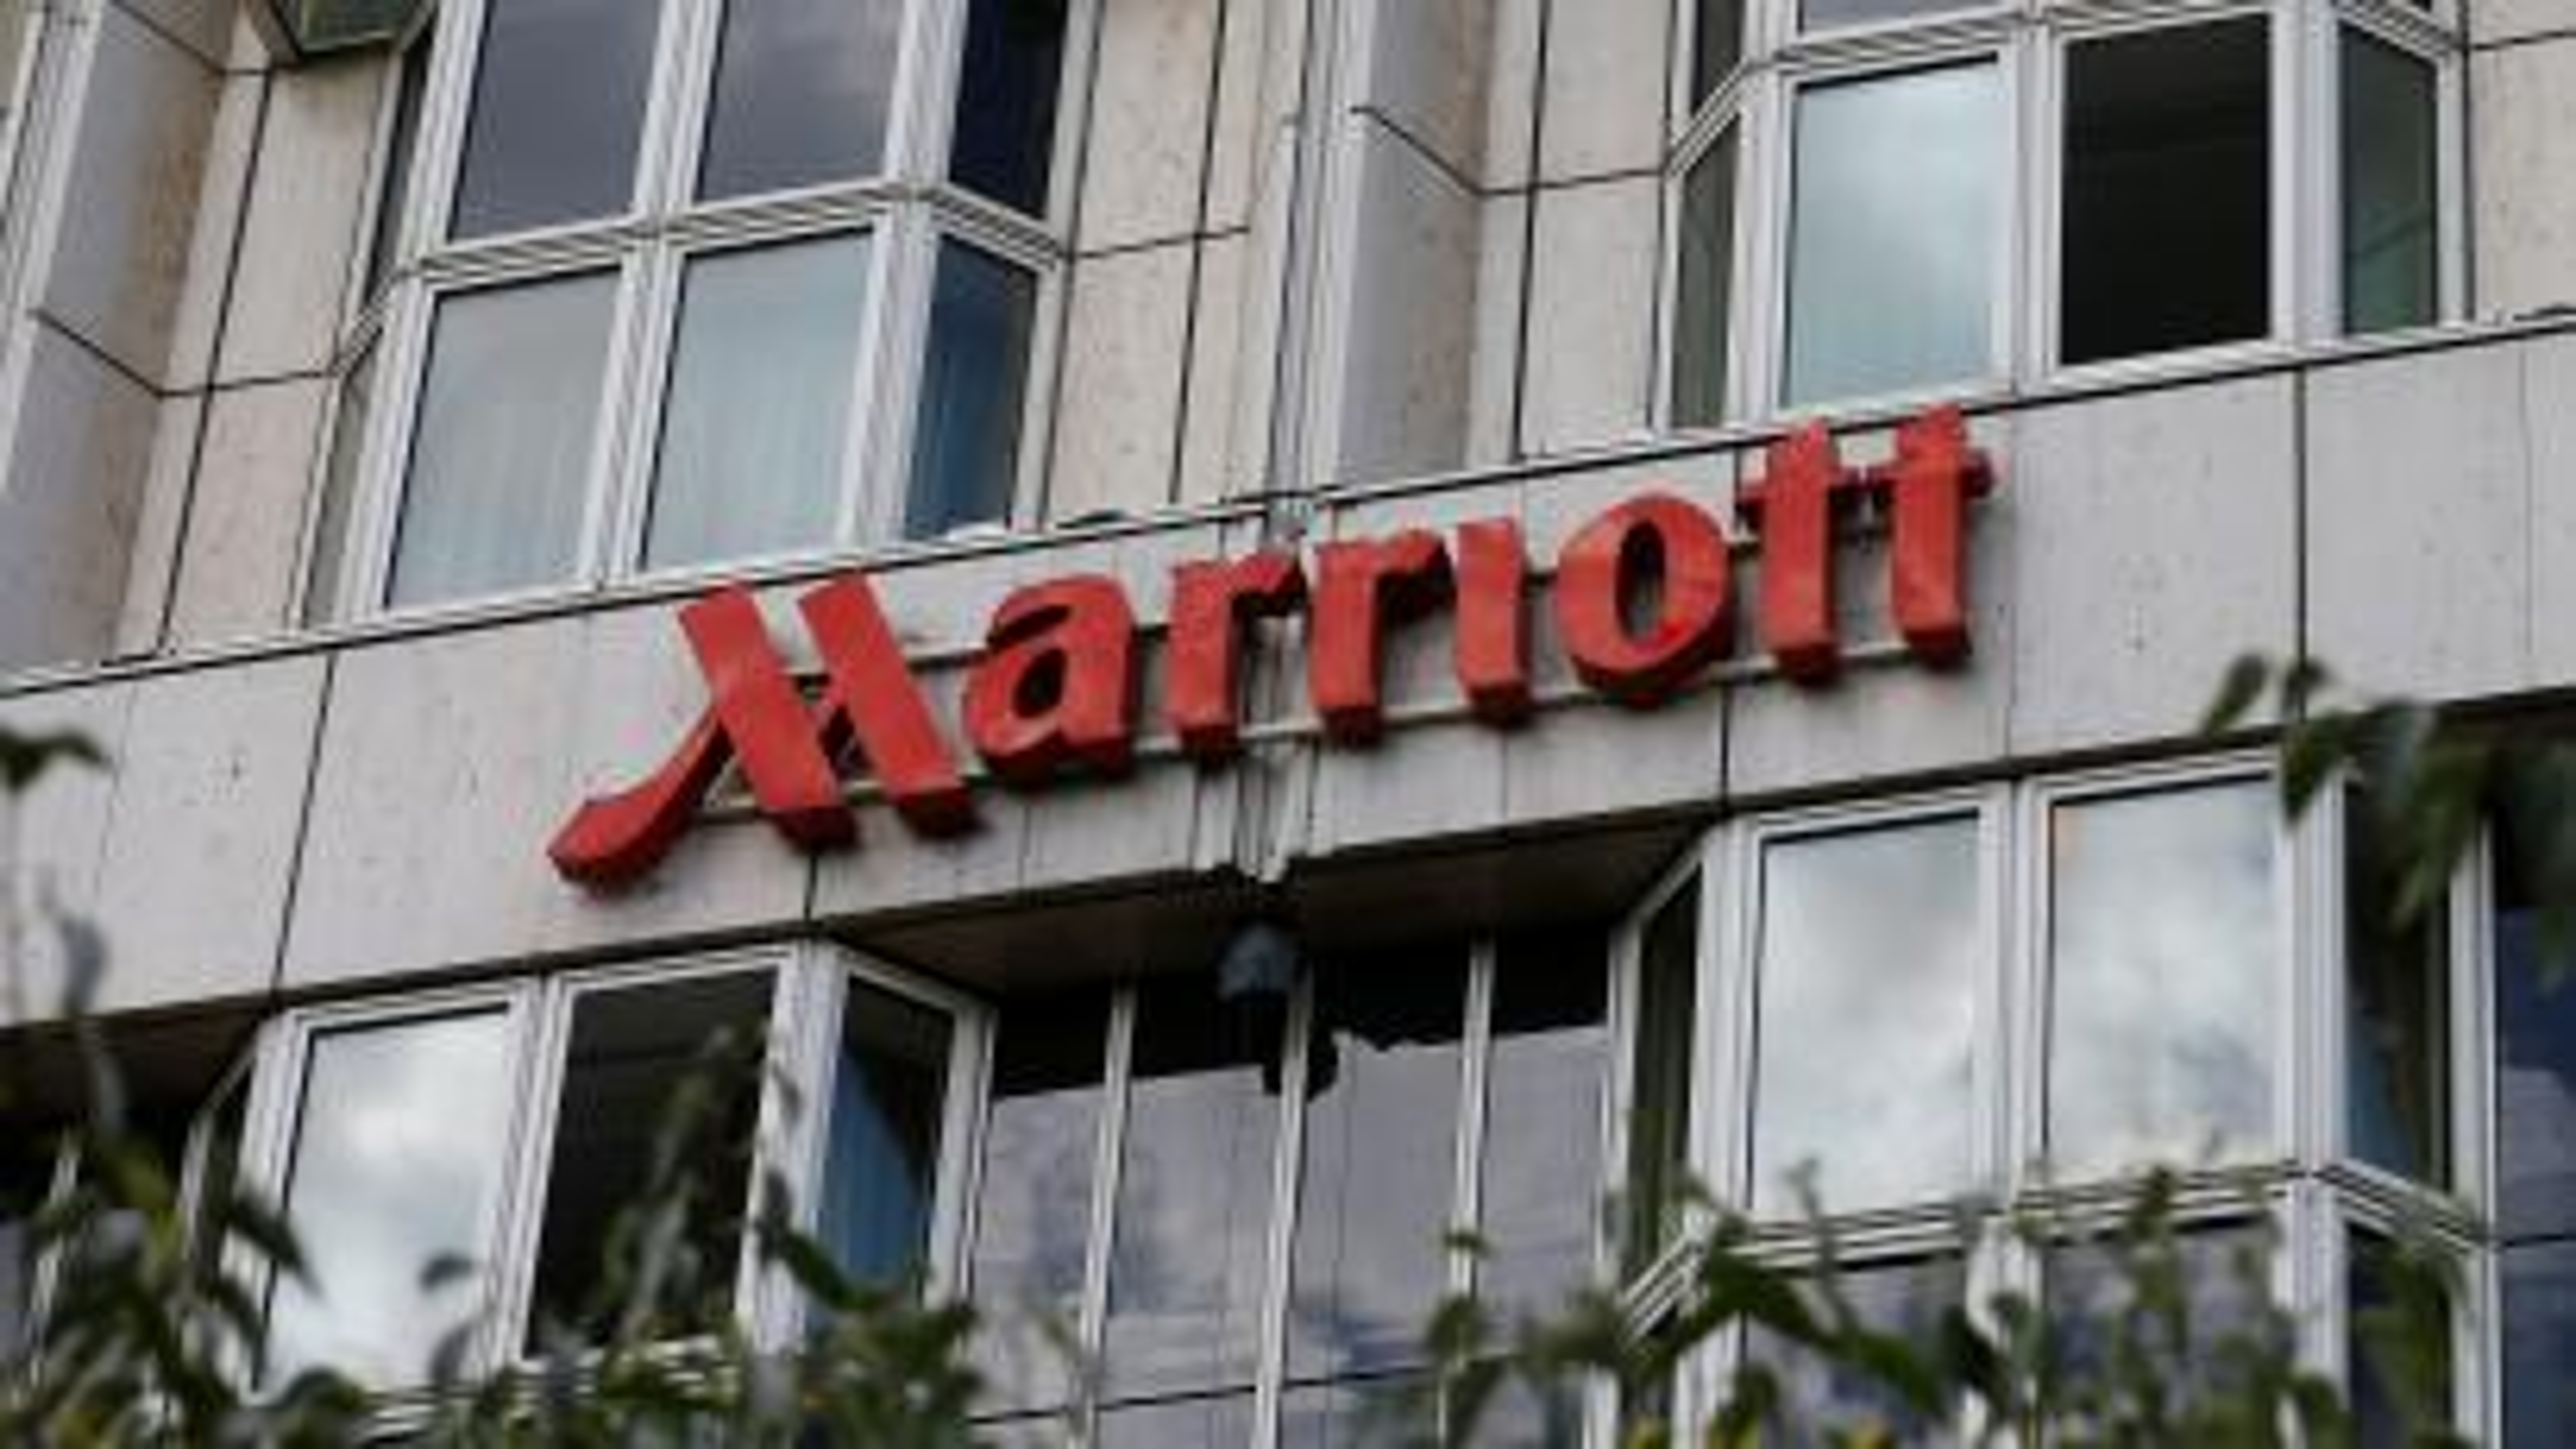 The logo of Marriott hotel is seen in Vienna